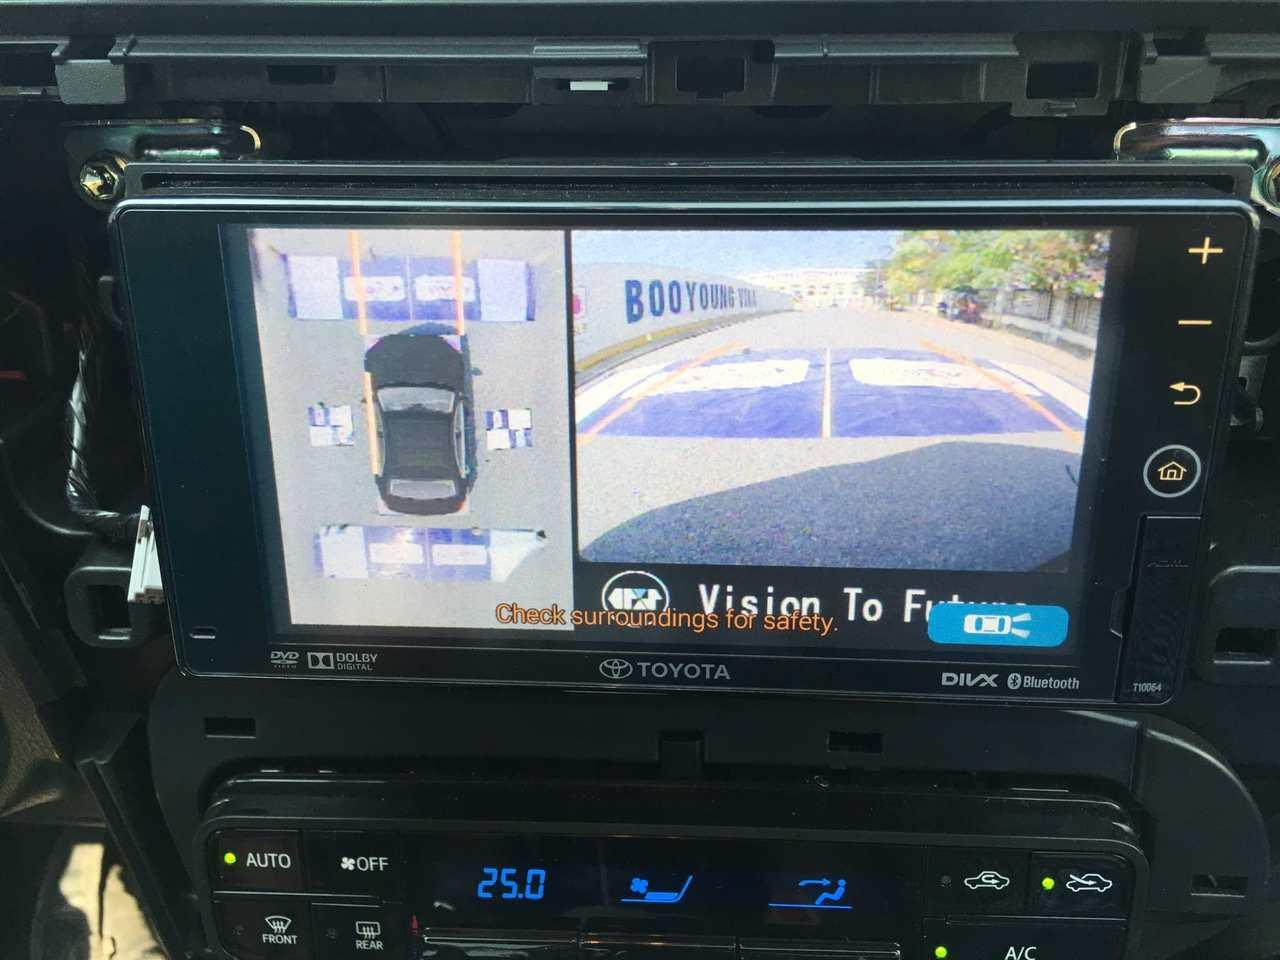 Camera 360 Oris cho xe Toyota Corola Alltis 2018